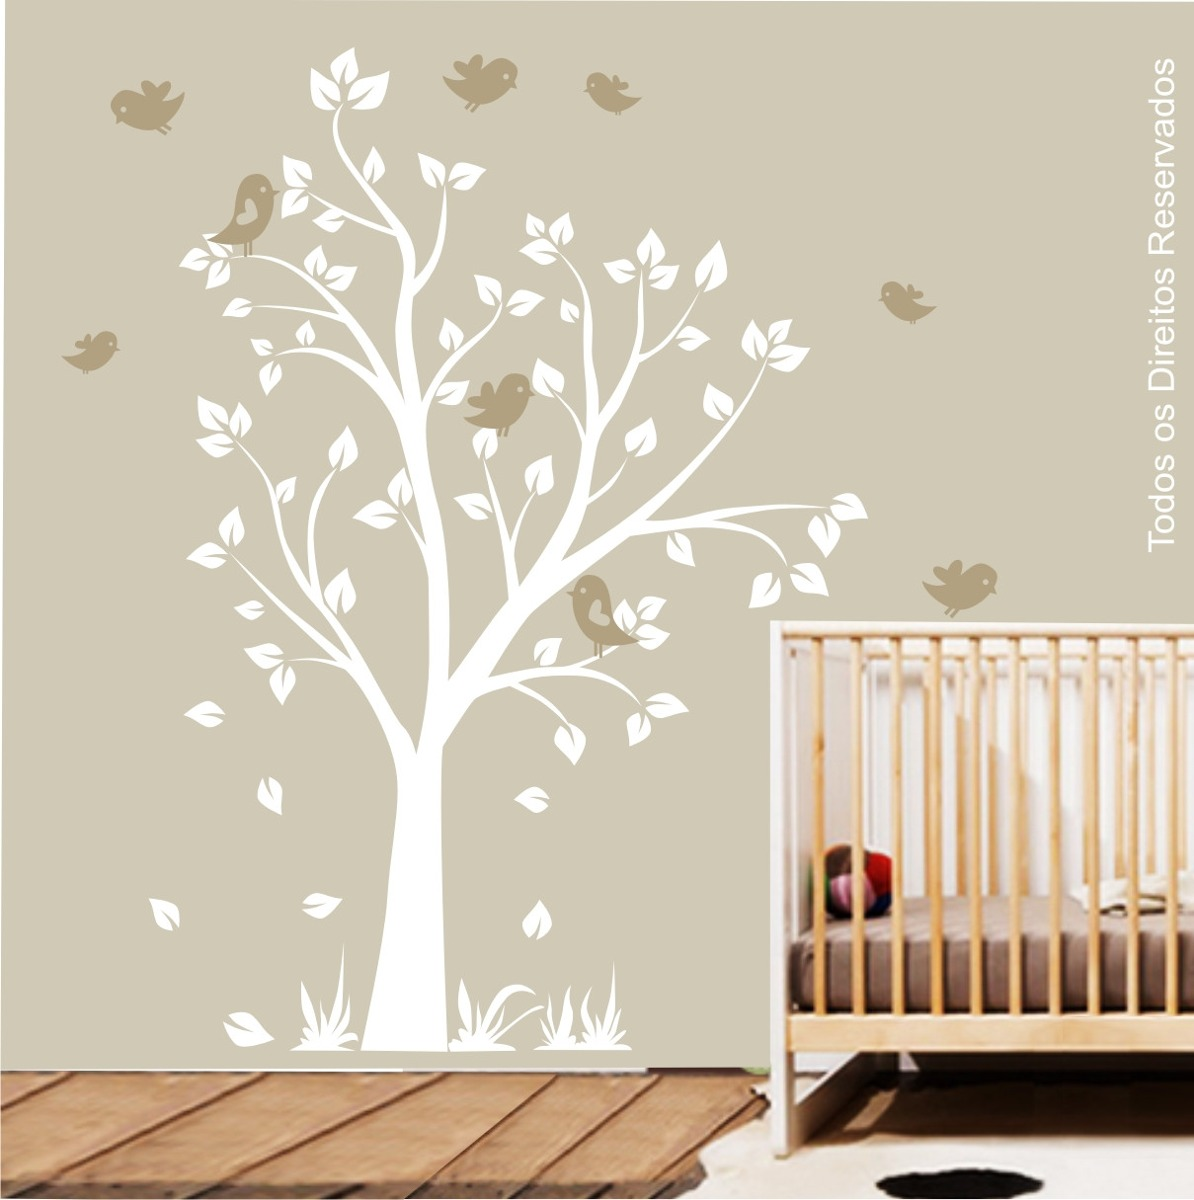 Artesanato Mobile Infantil Passo A Passo ~ Adesivo Papel Parede Infantil Passaros Safari Arvore Zoo M93 R$ 148,00 em Mercado Livre